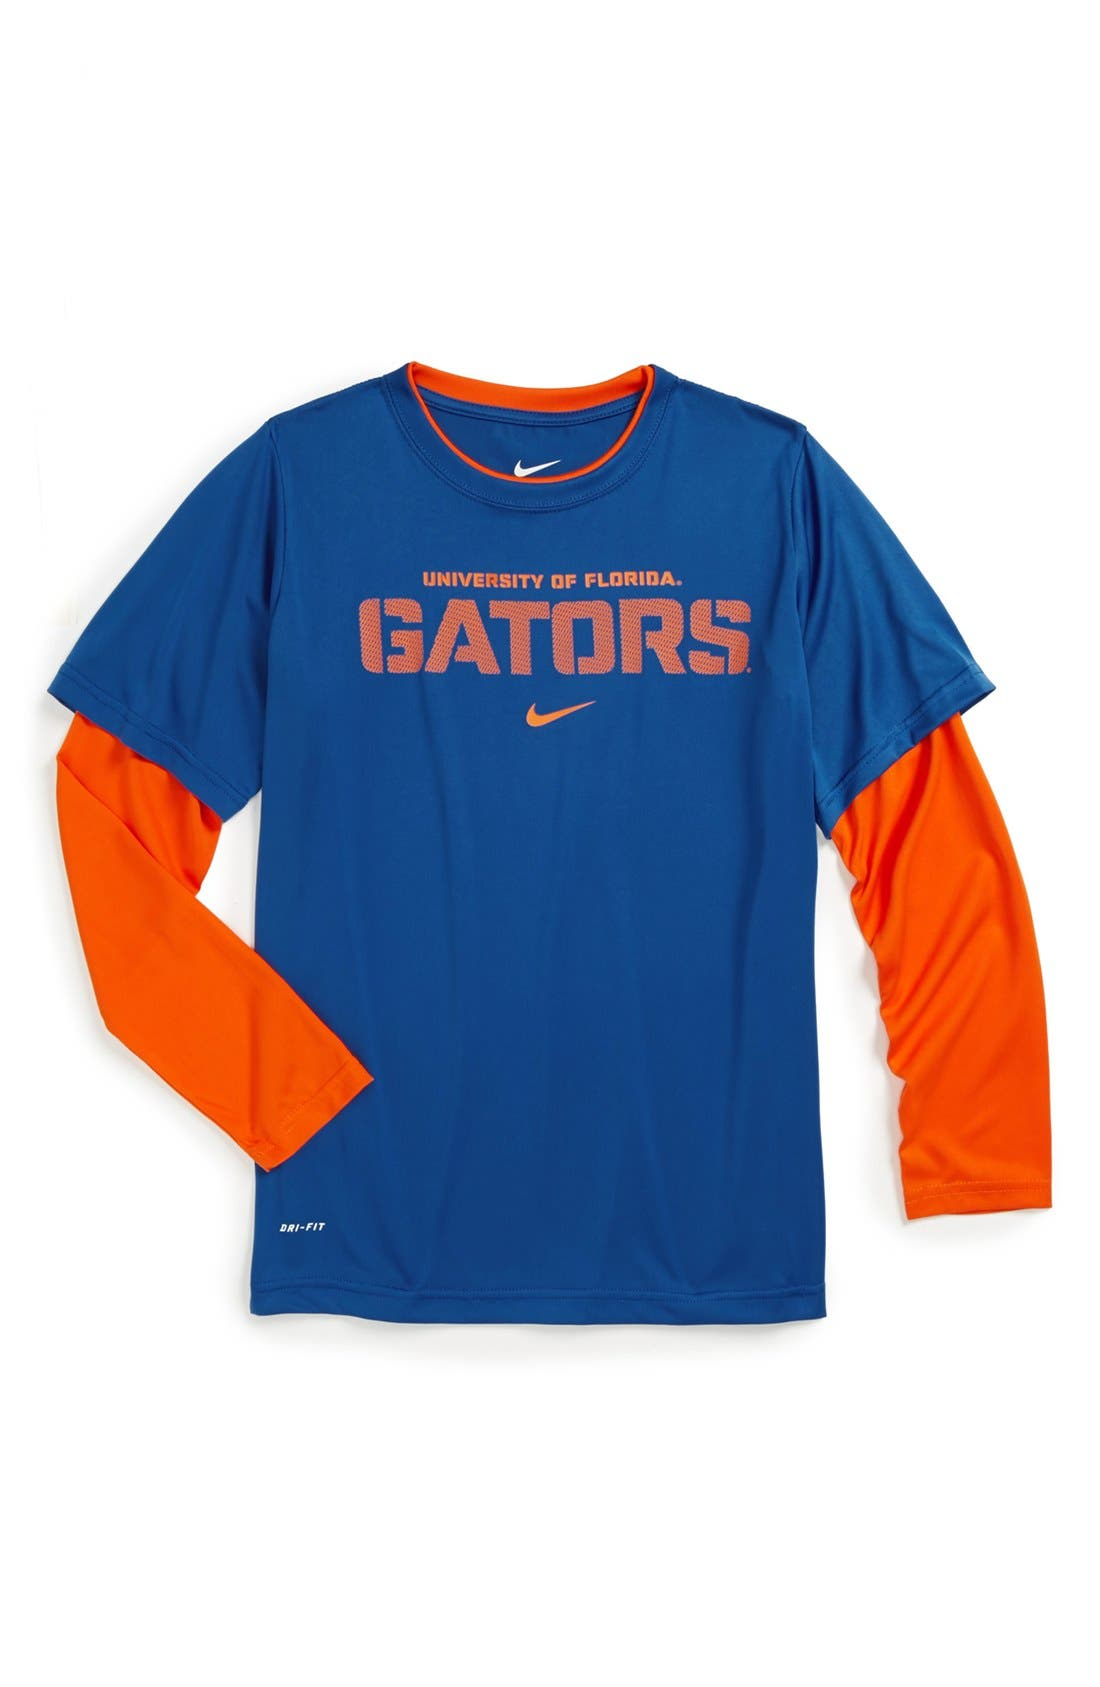 Alternate Image 1 Selected - Nike 'University of Florida Gators' Dri-FIT Layered Sleeve Sport T-Shirt (Big Boys)